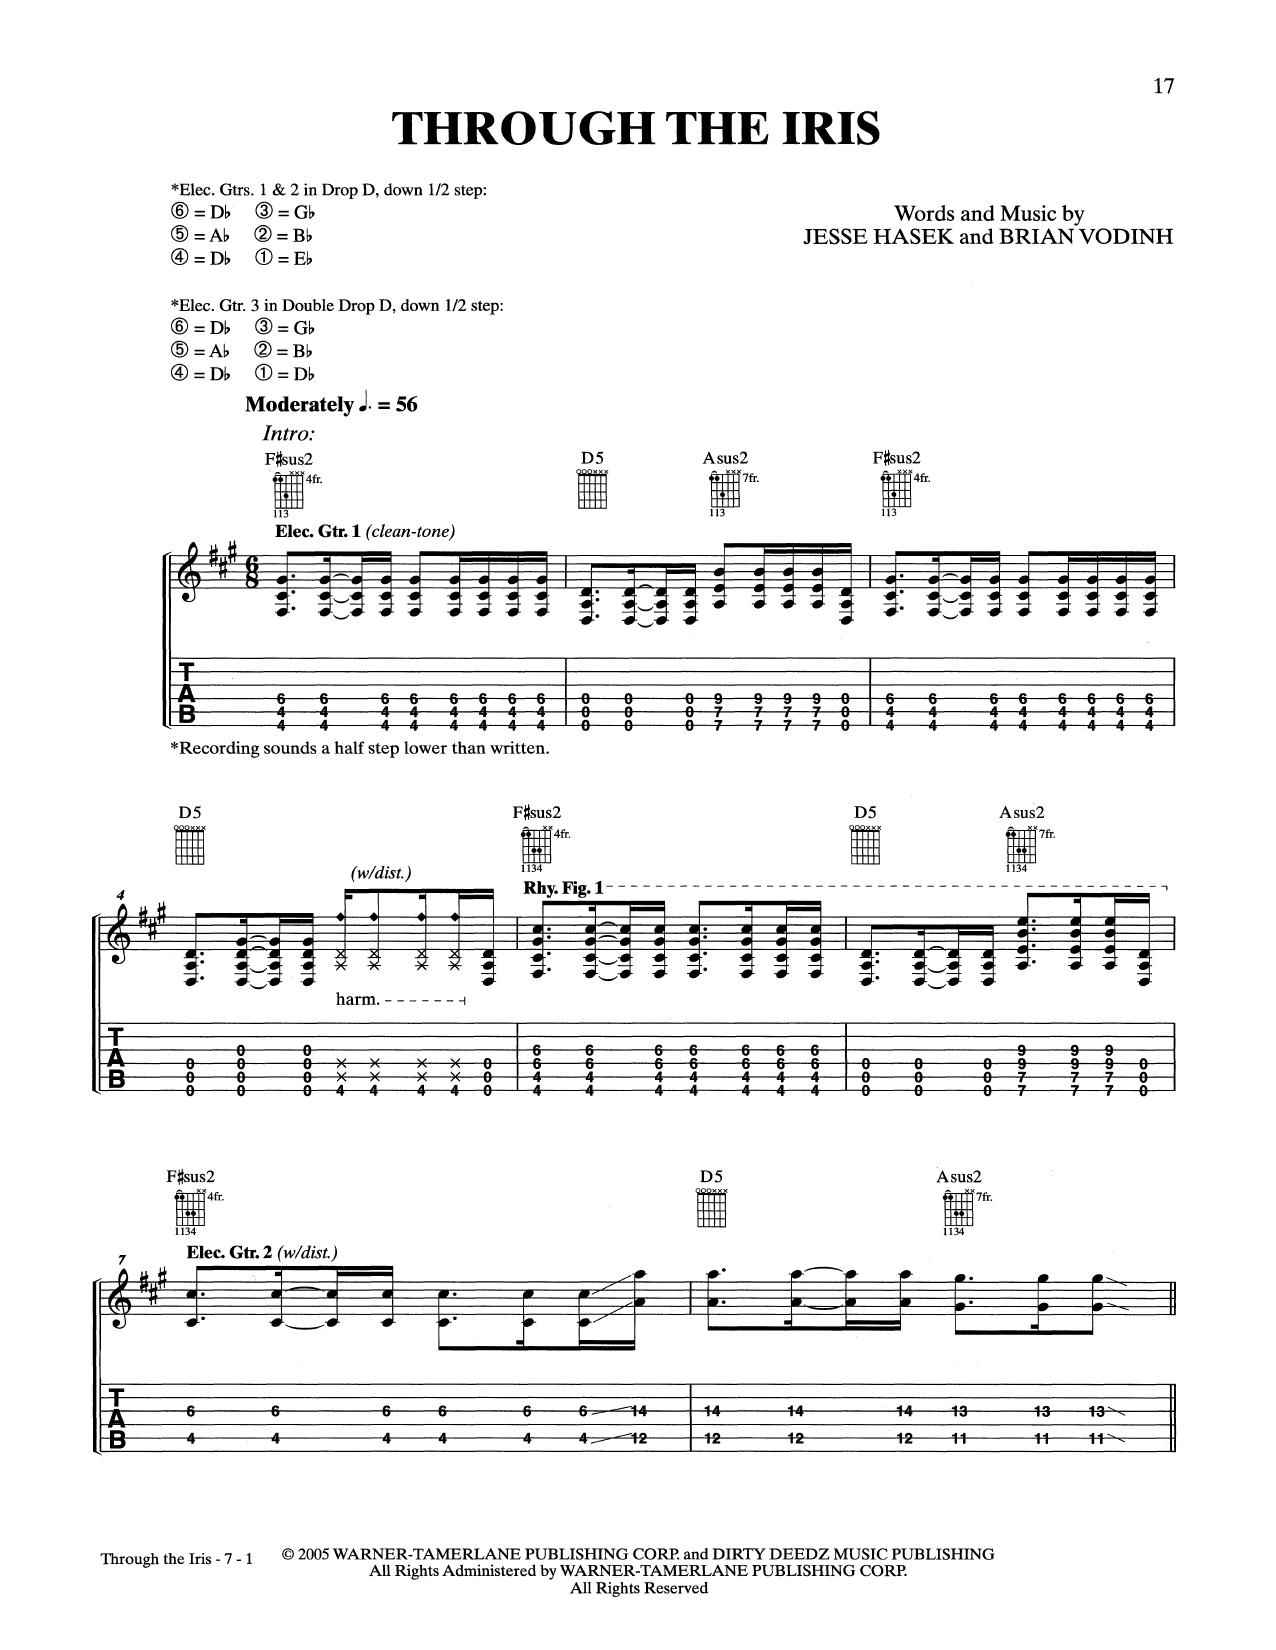 10 Years Through The Iris Sheet Music Notes Chords Printable